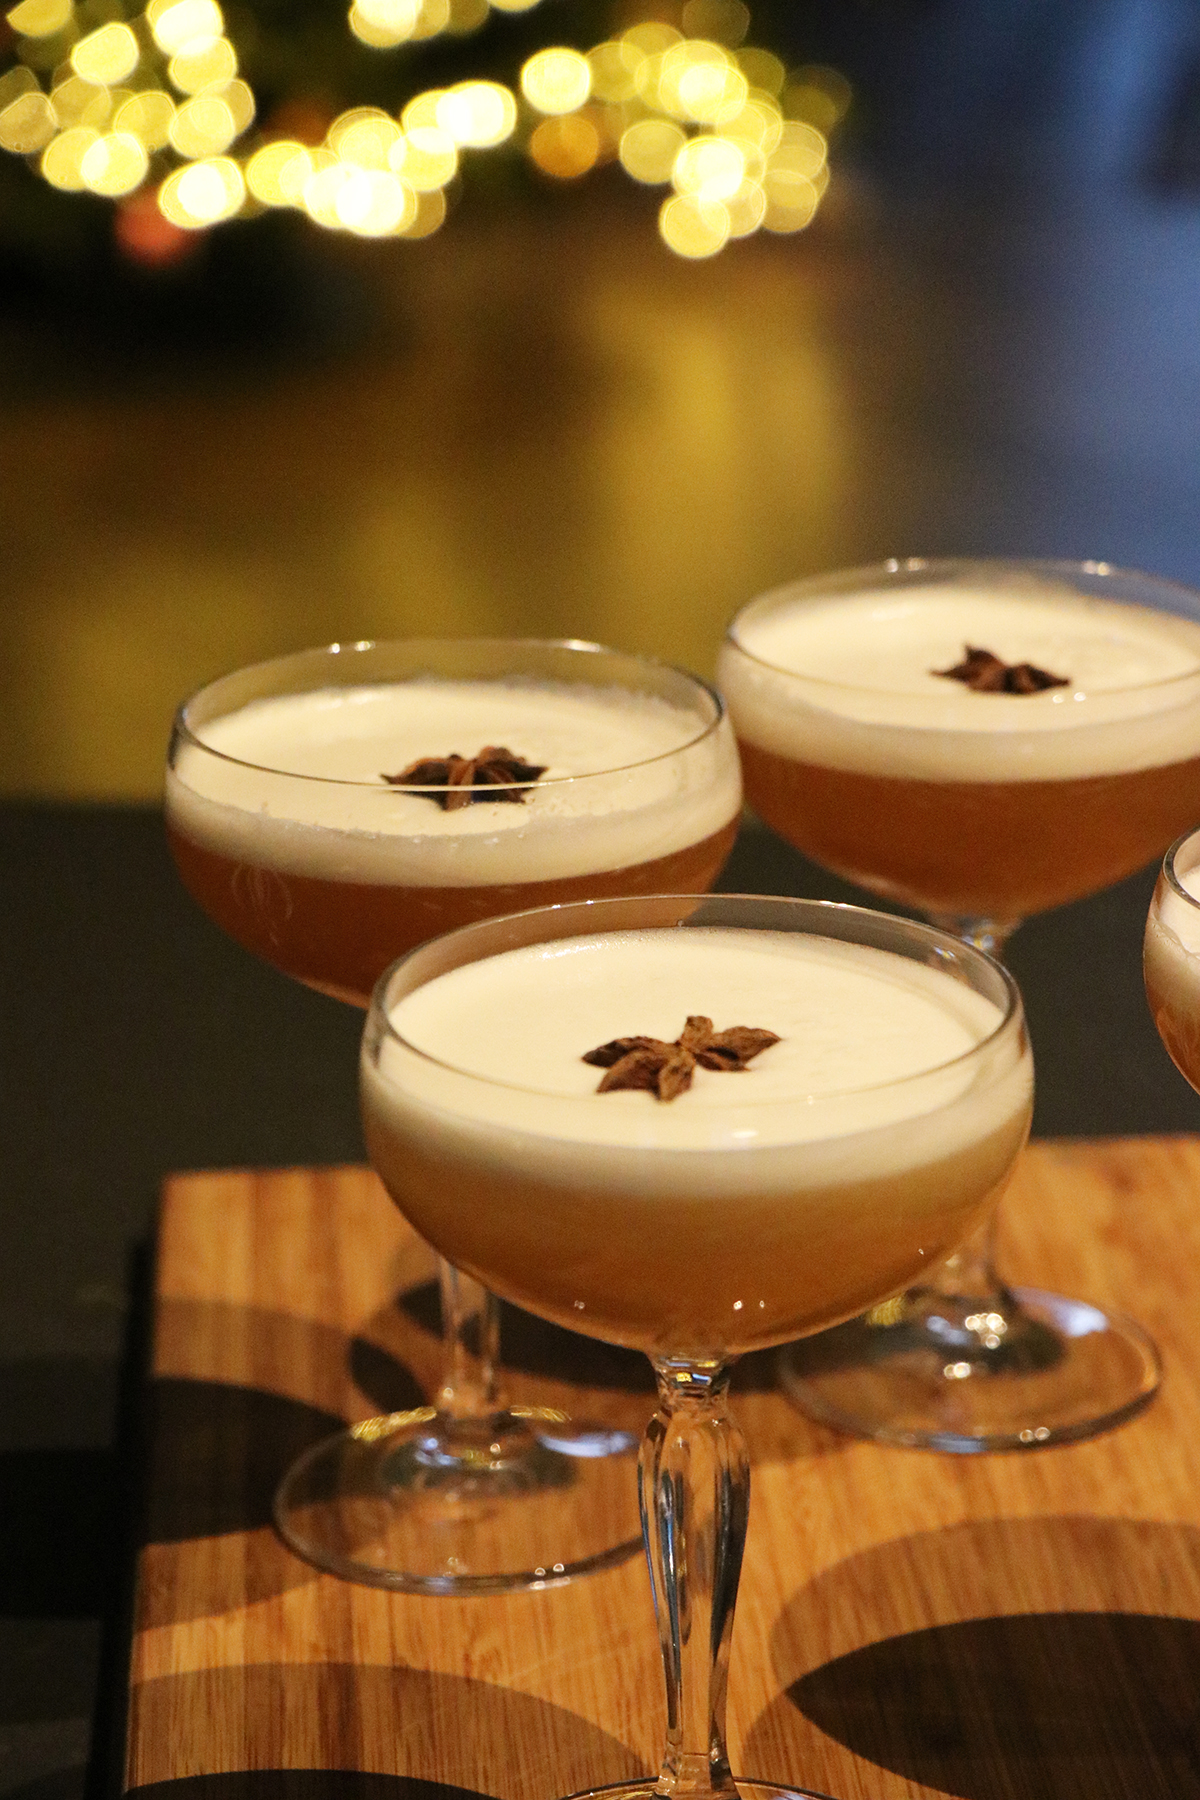 Spicy winter cocktail met gin, steranijs en eiwit